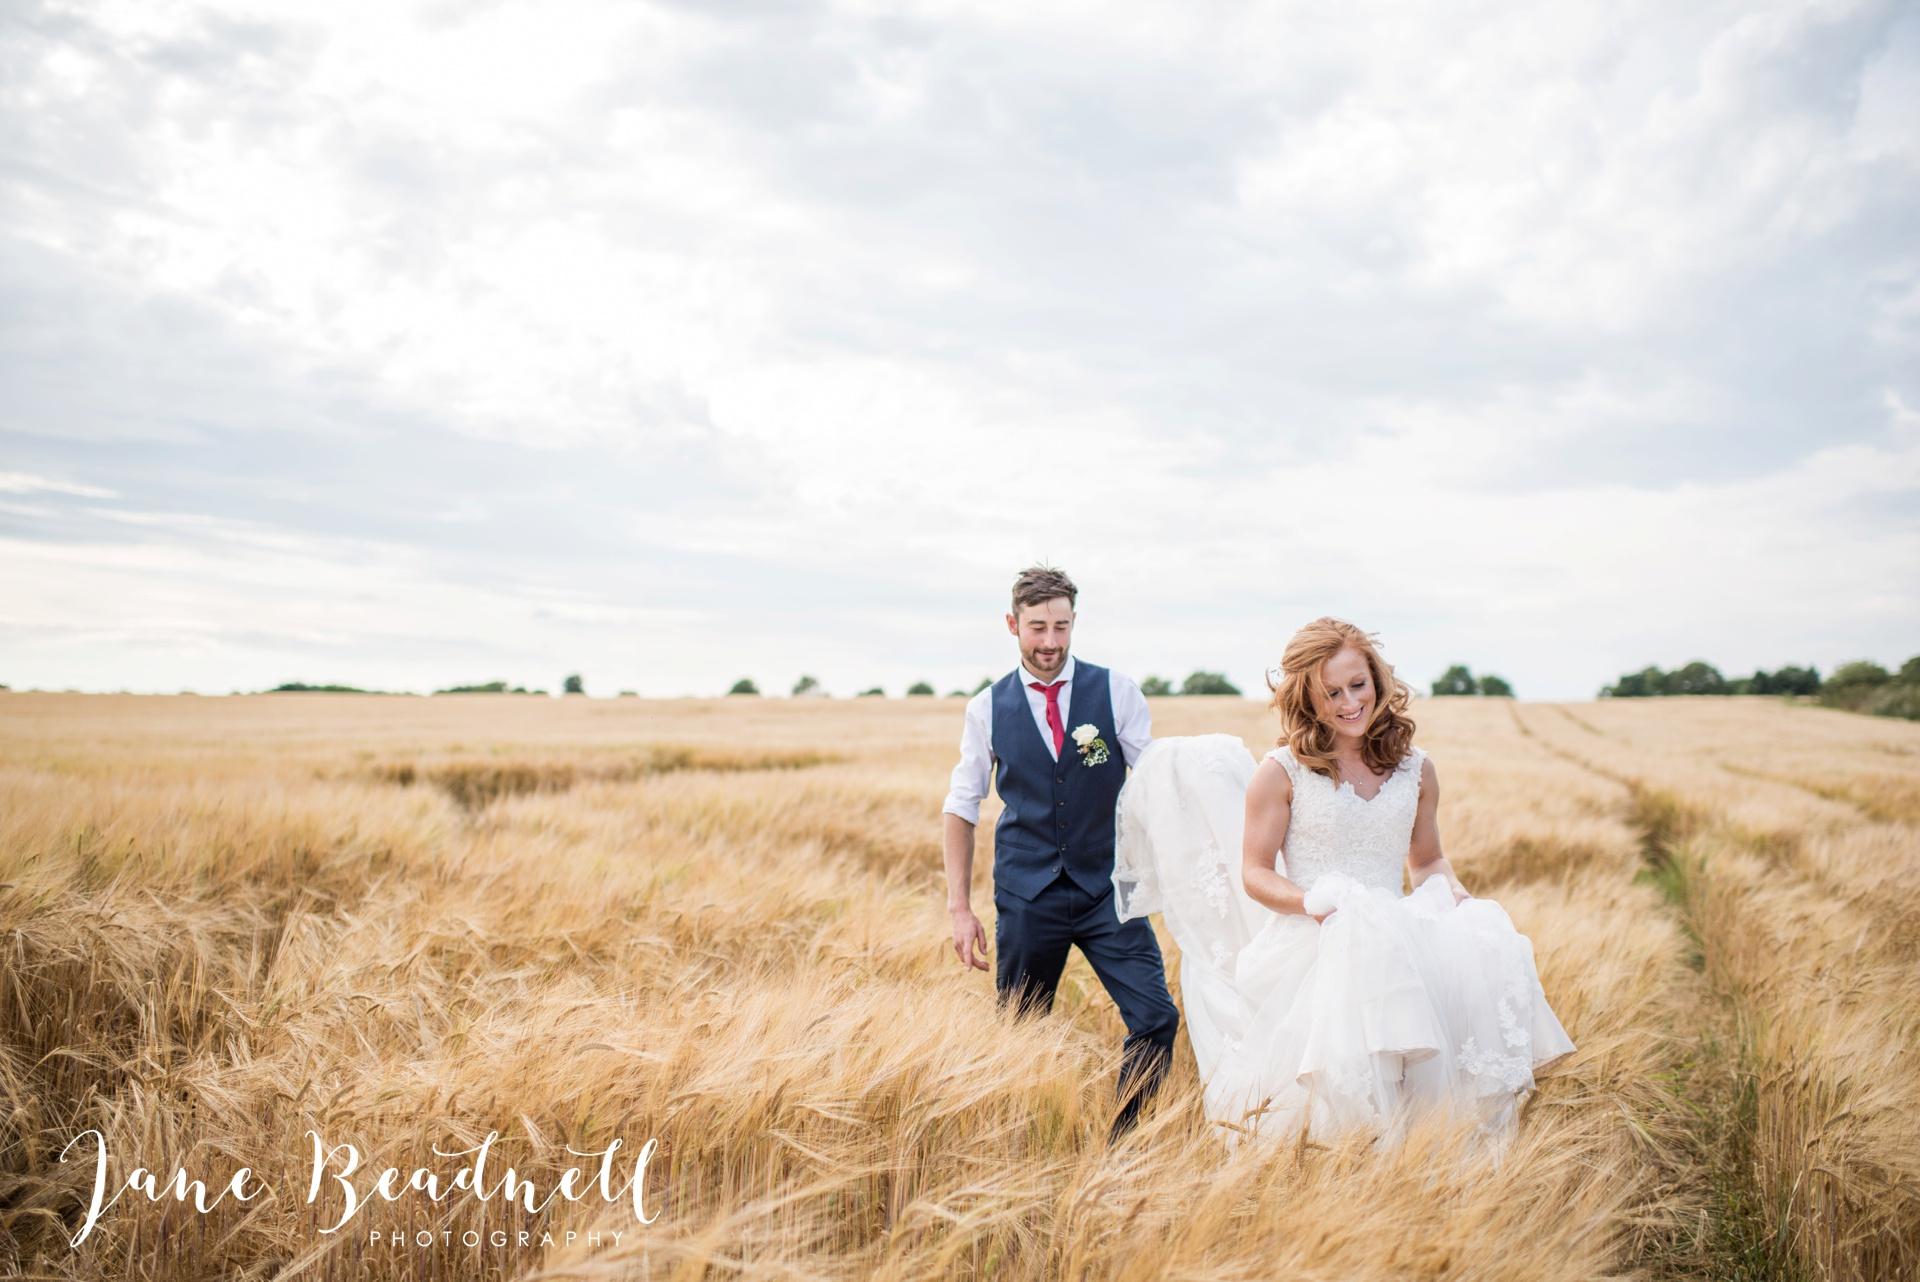 yorkshire-fine-art-wedding-photographer-jane-beadnell-photography-poppleton-york_0140